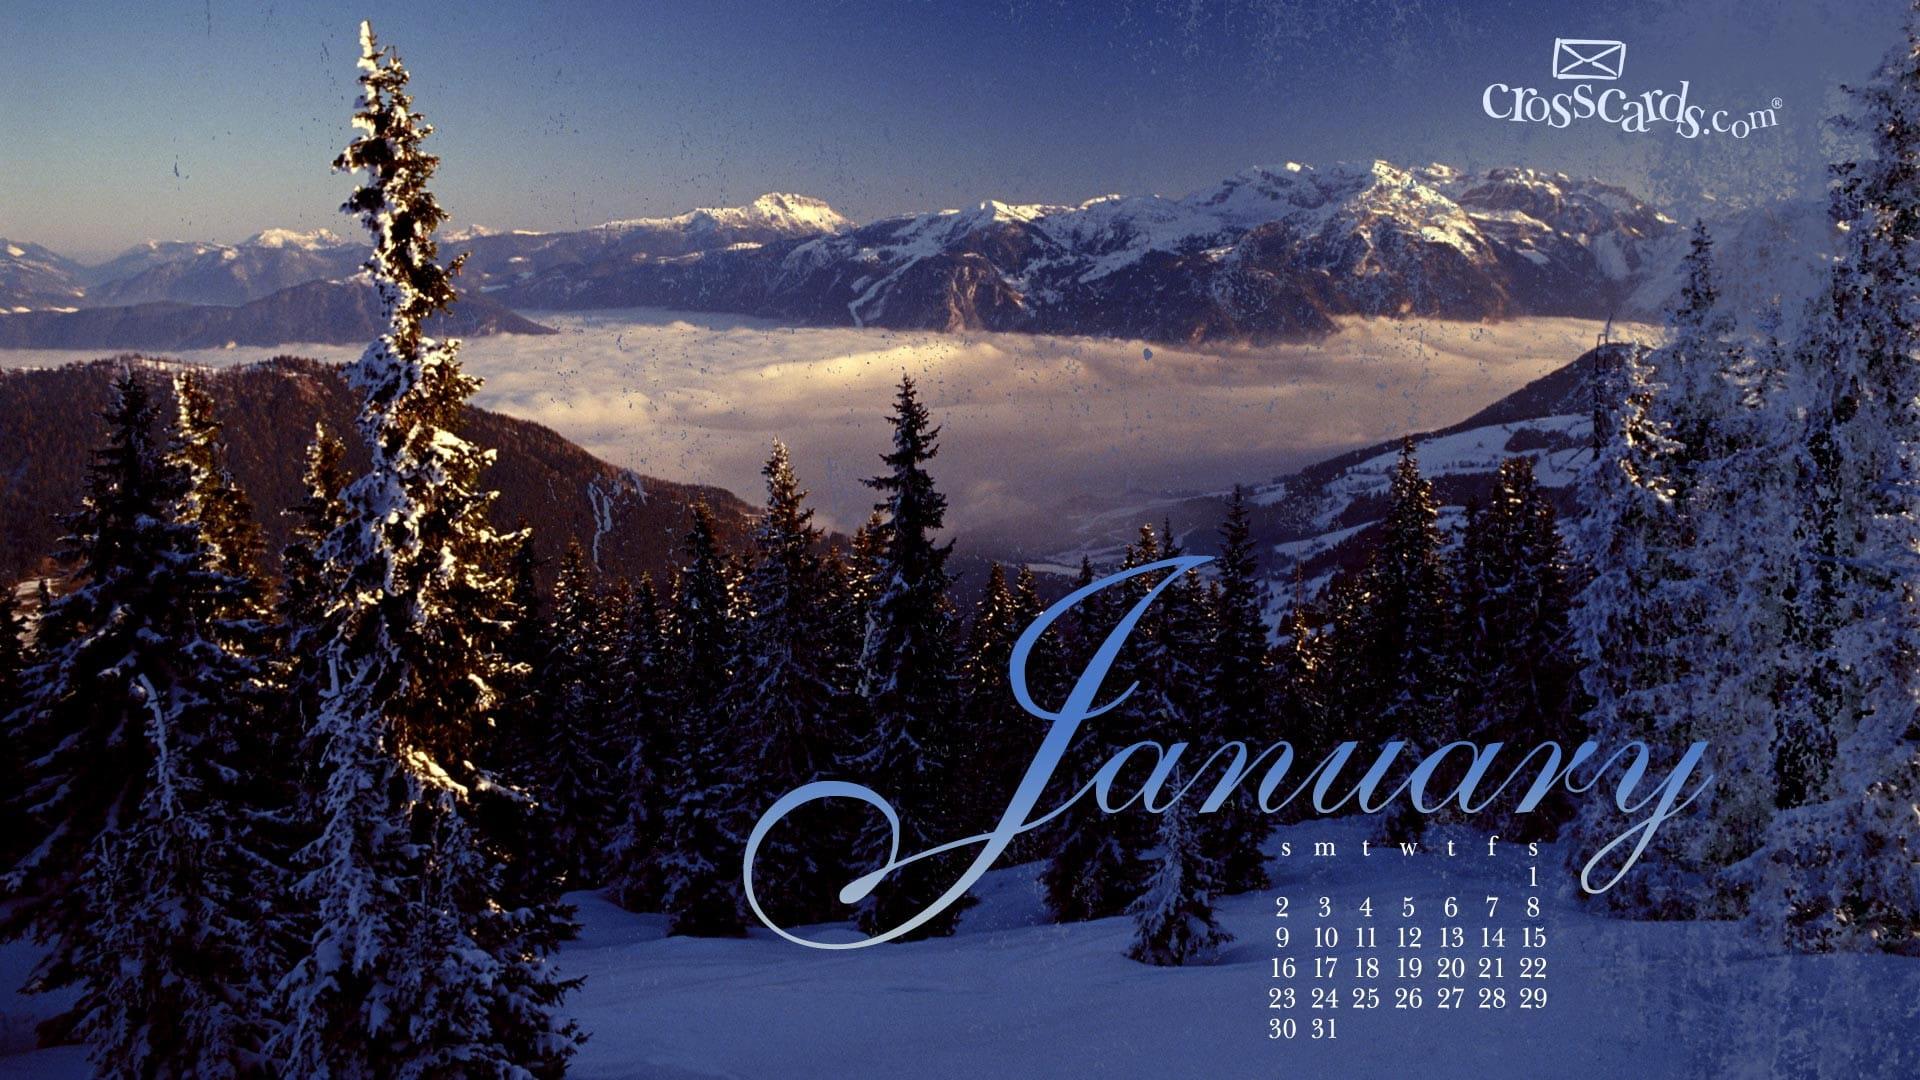 January Calendar Wallpaper Hd : January desktop calendar free wallpaper